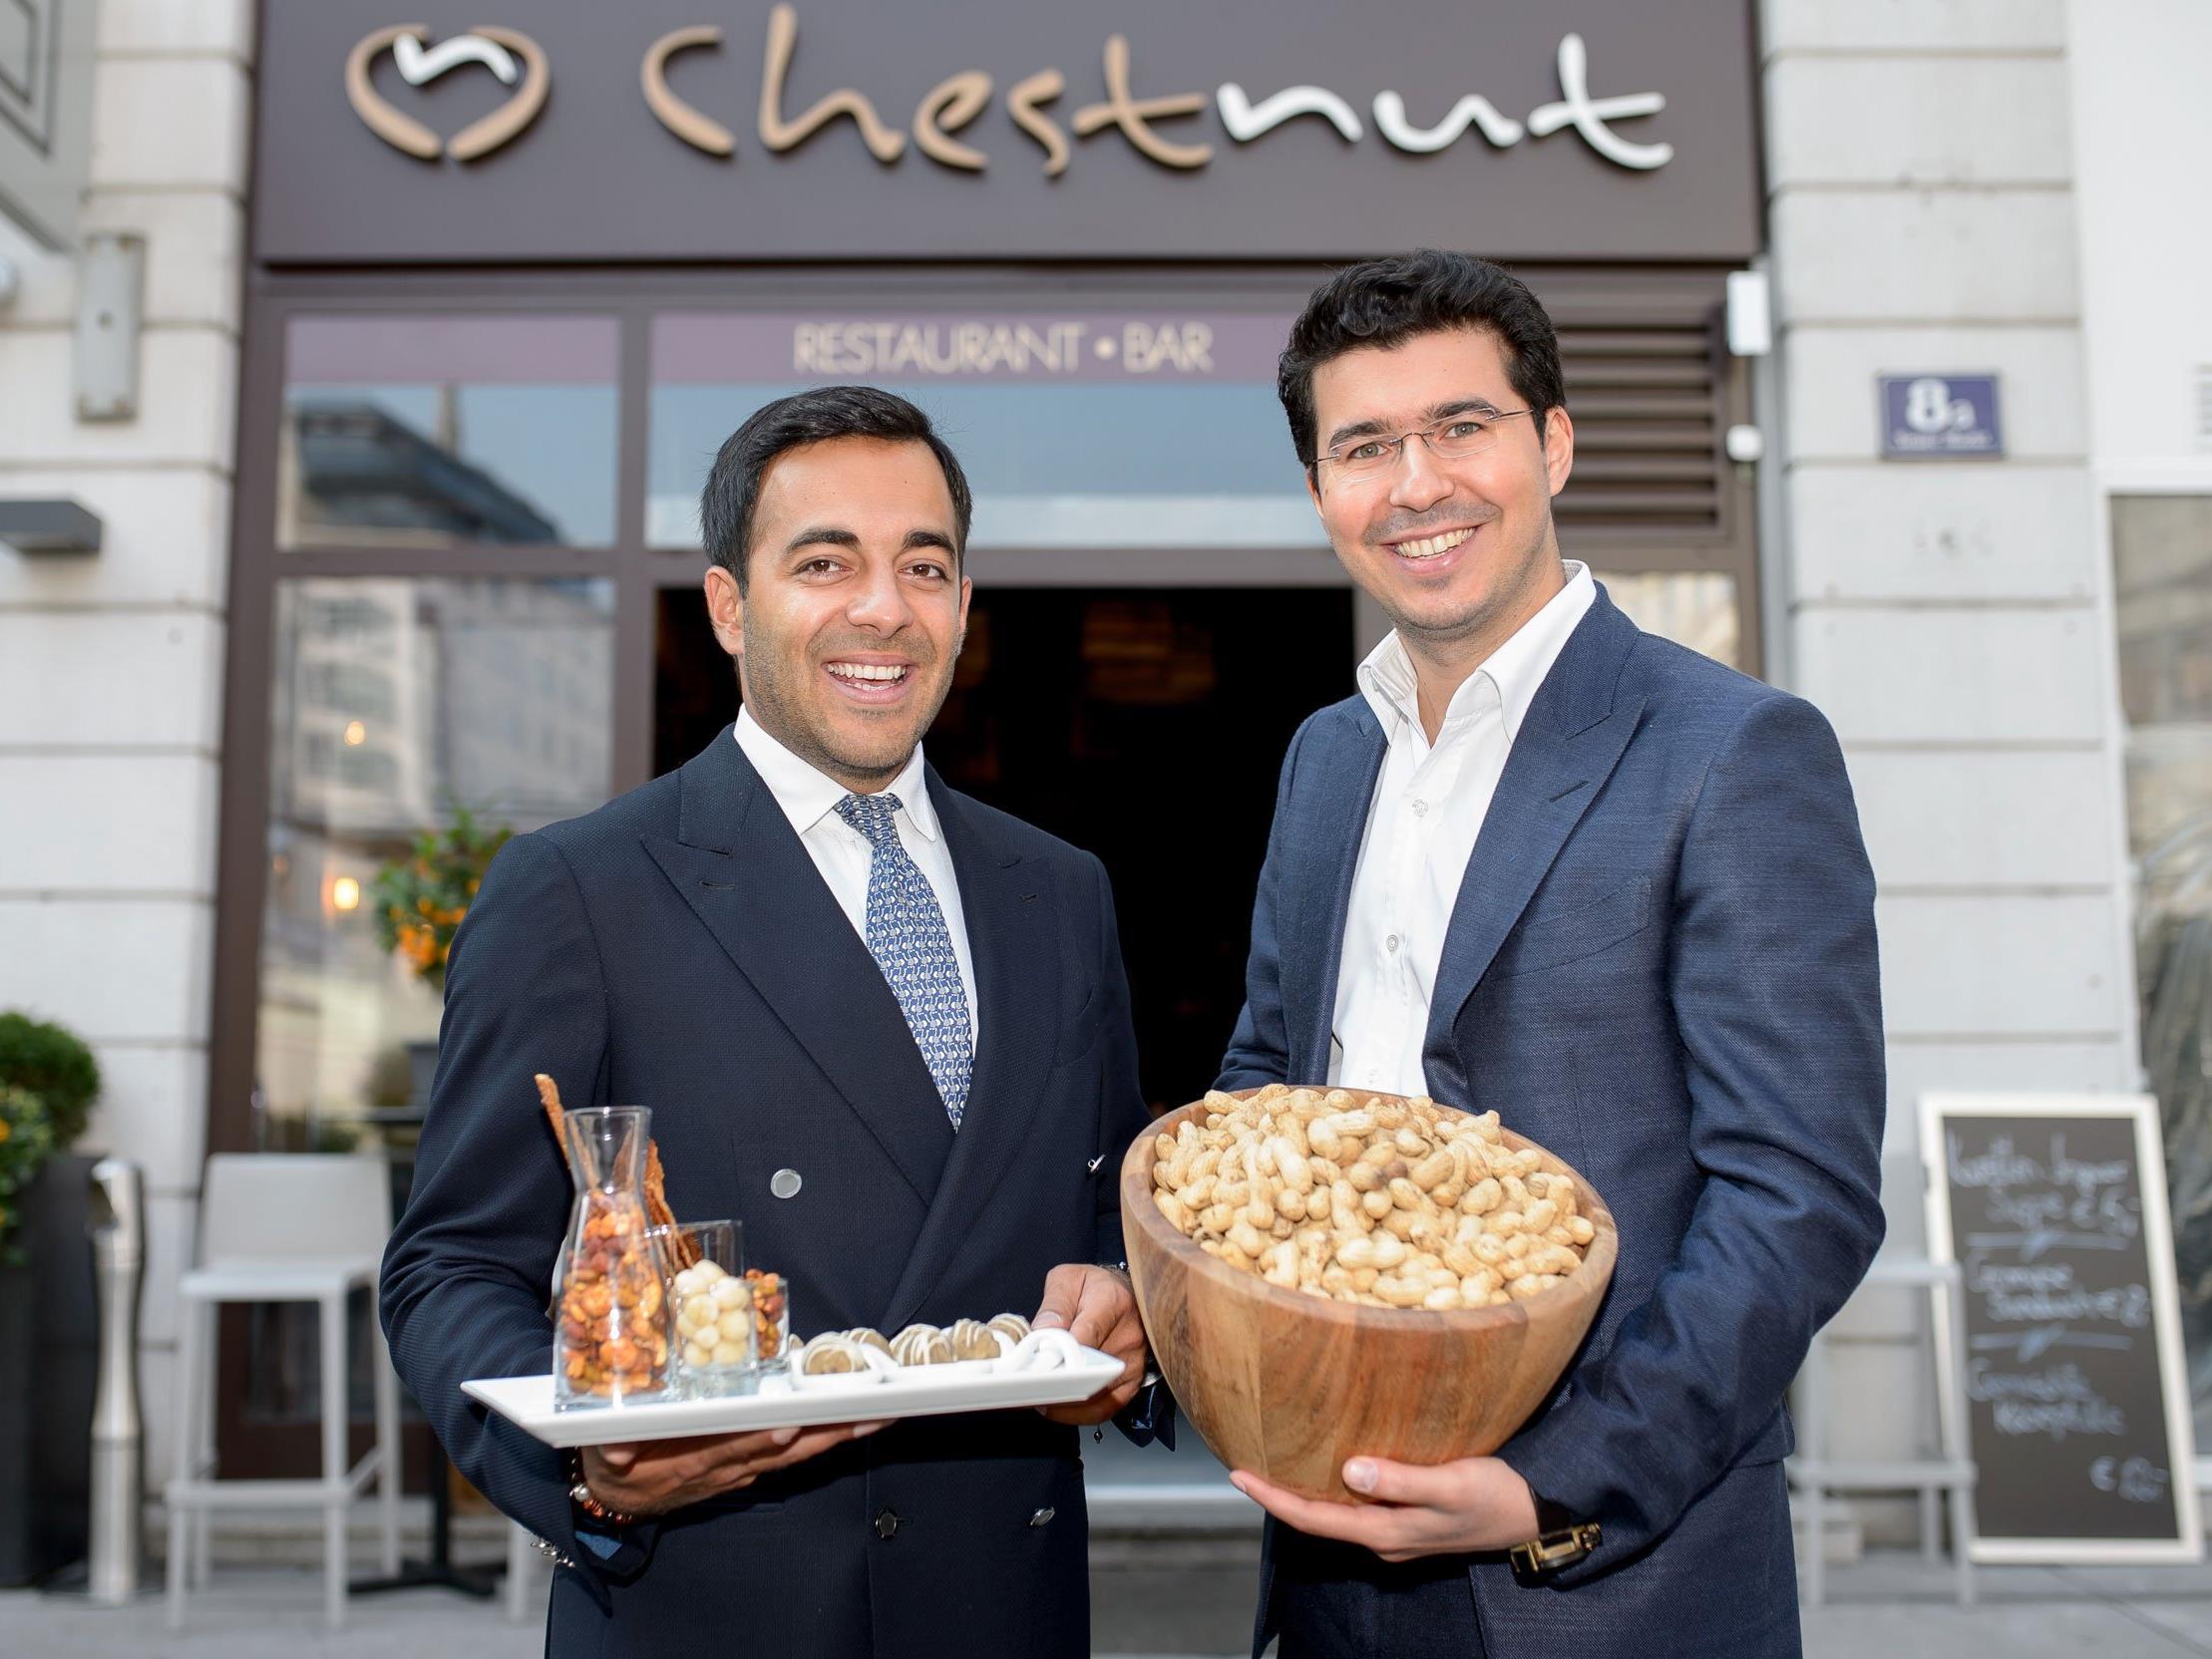 Asim Hasanov und Faradj Akhverdiev (Gastronomen von Chestnut)